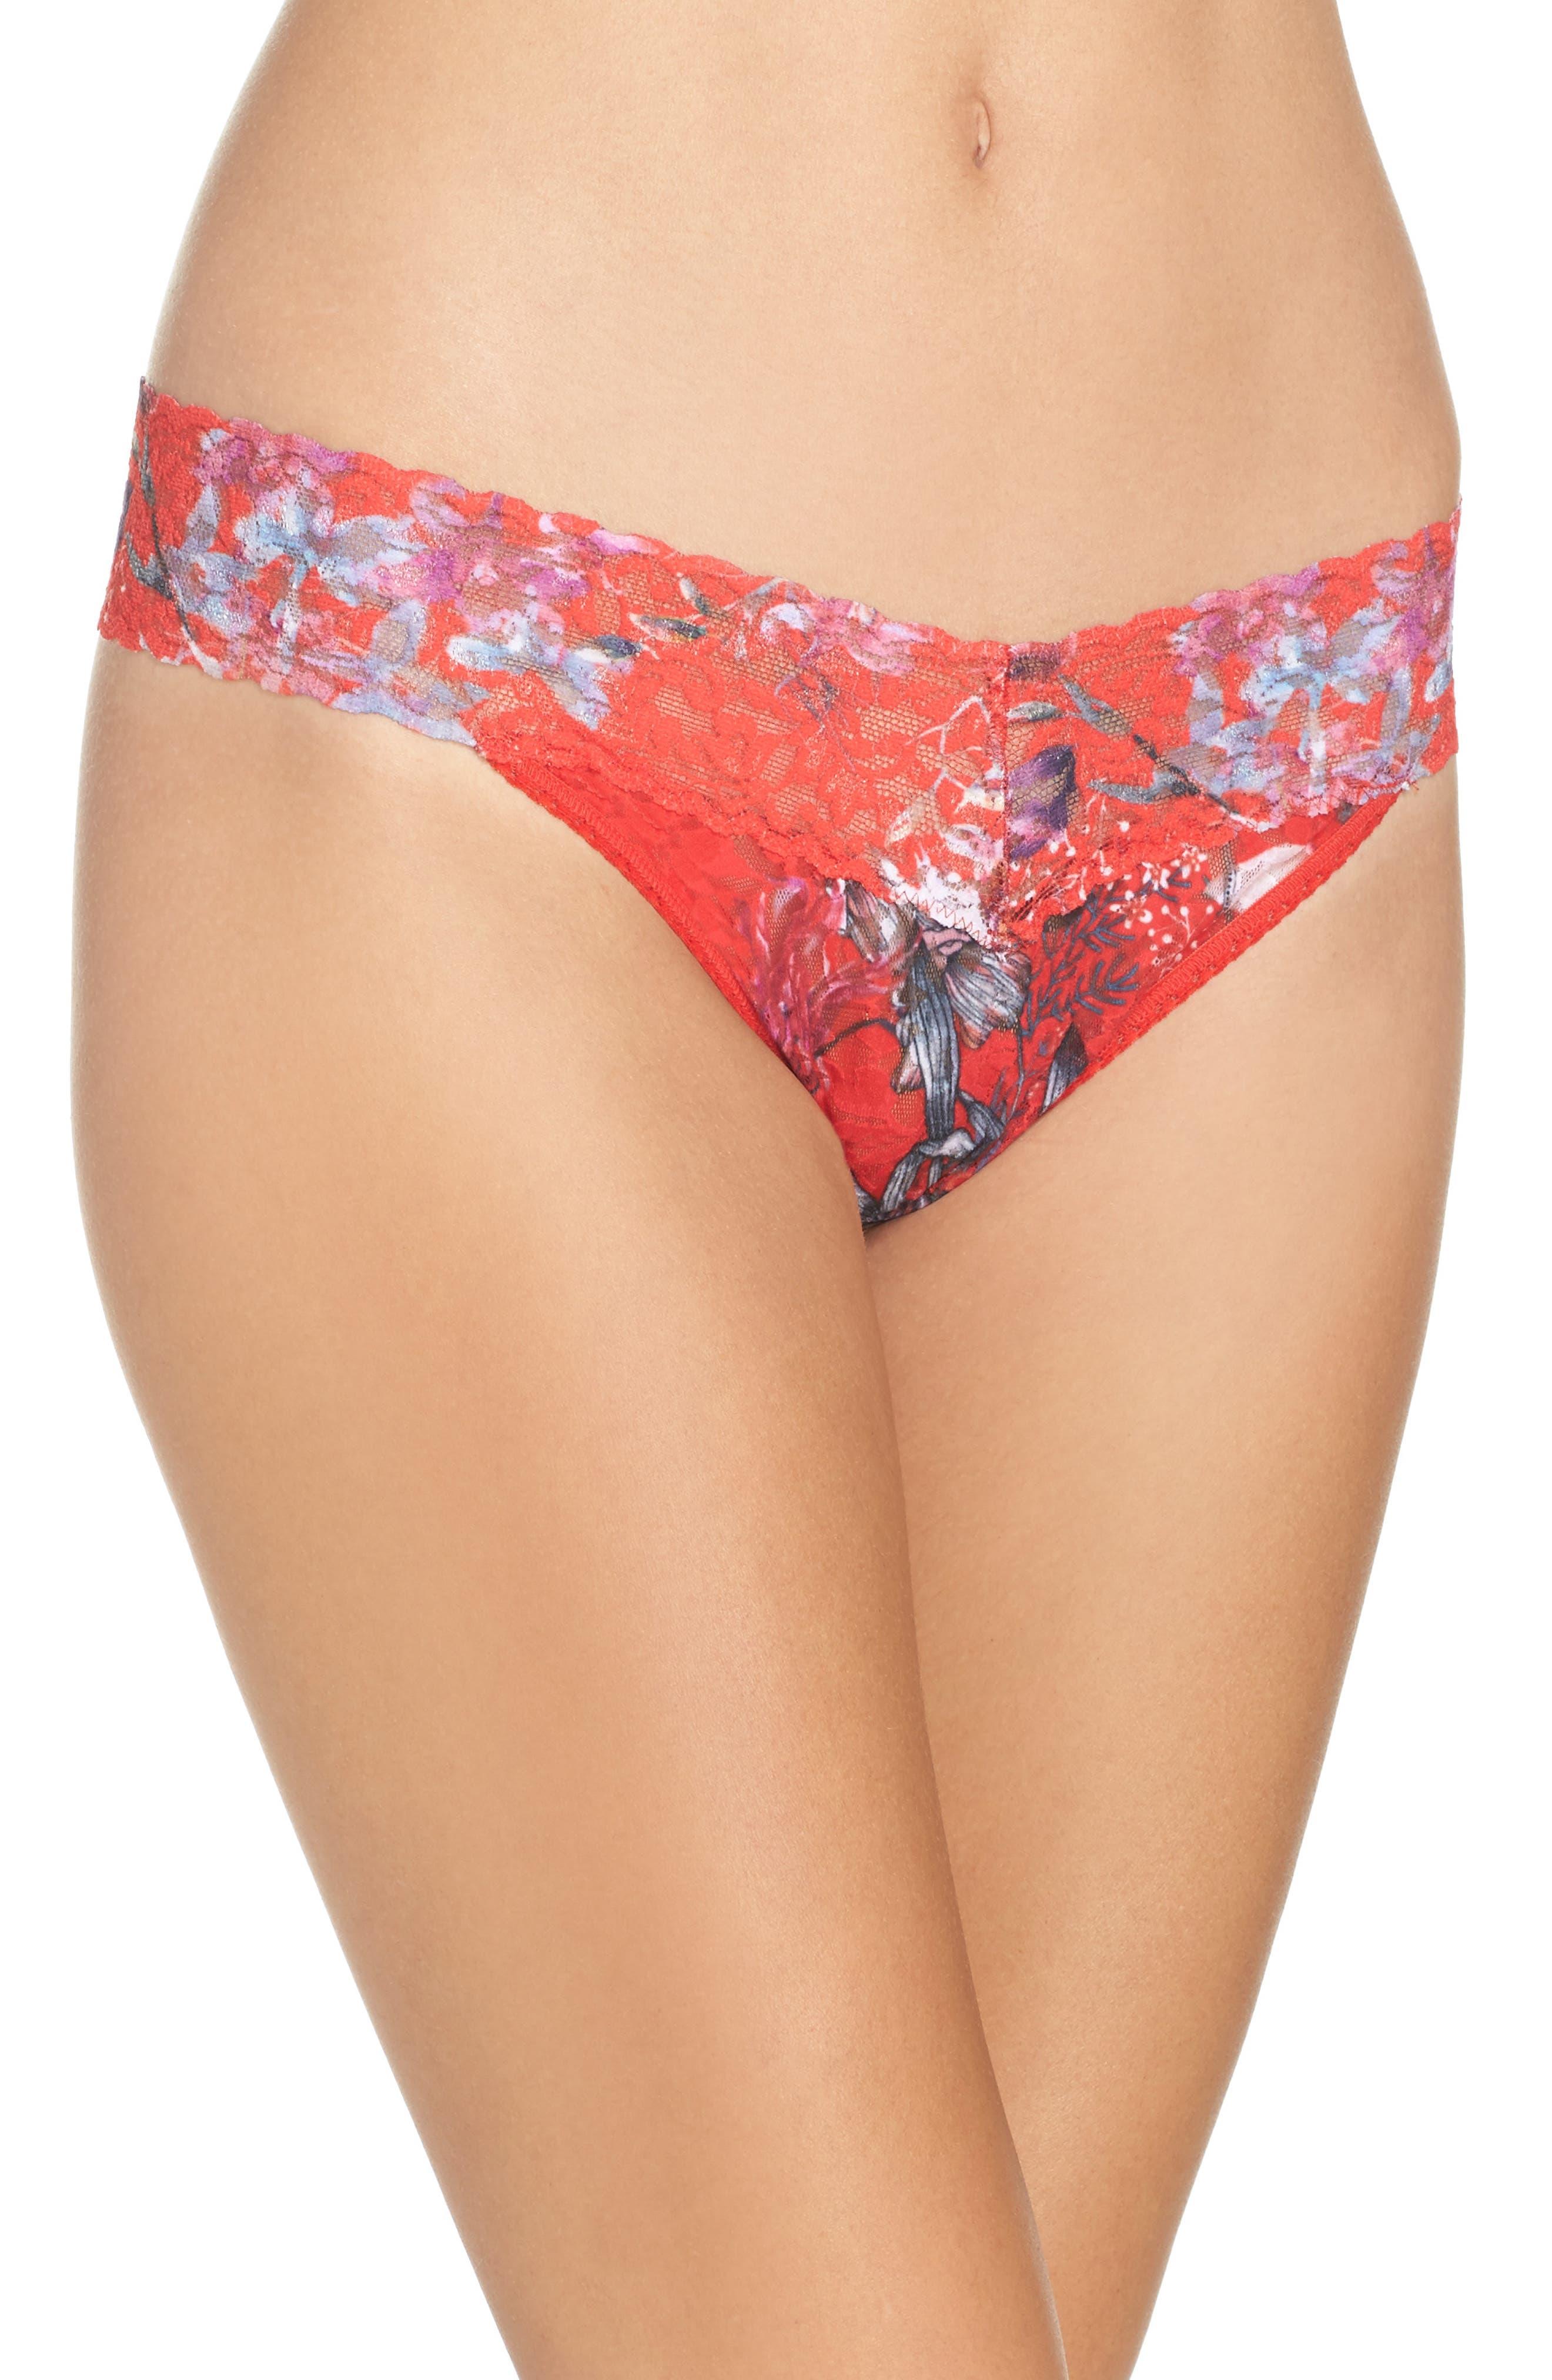 Main Image - Hanky Panky Fiery Floral Original Rise Thong